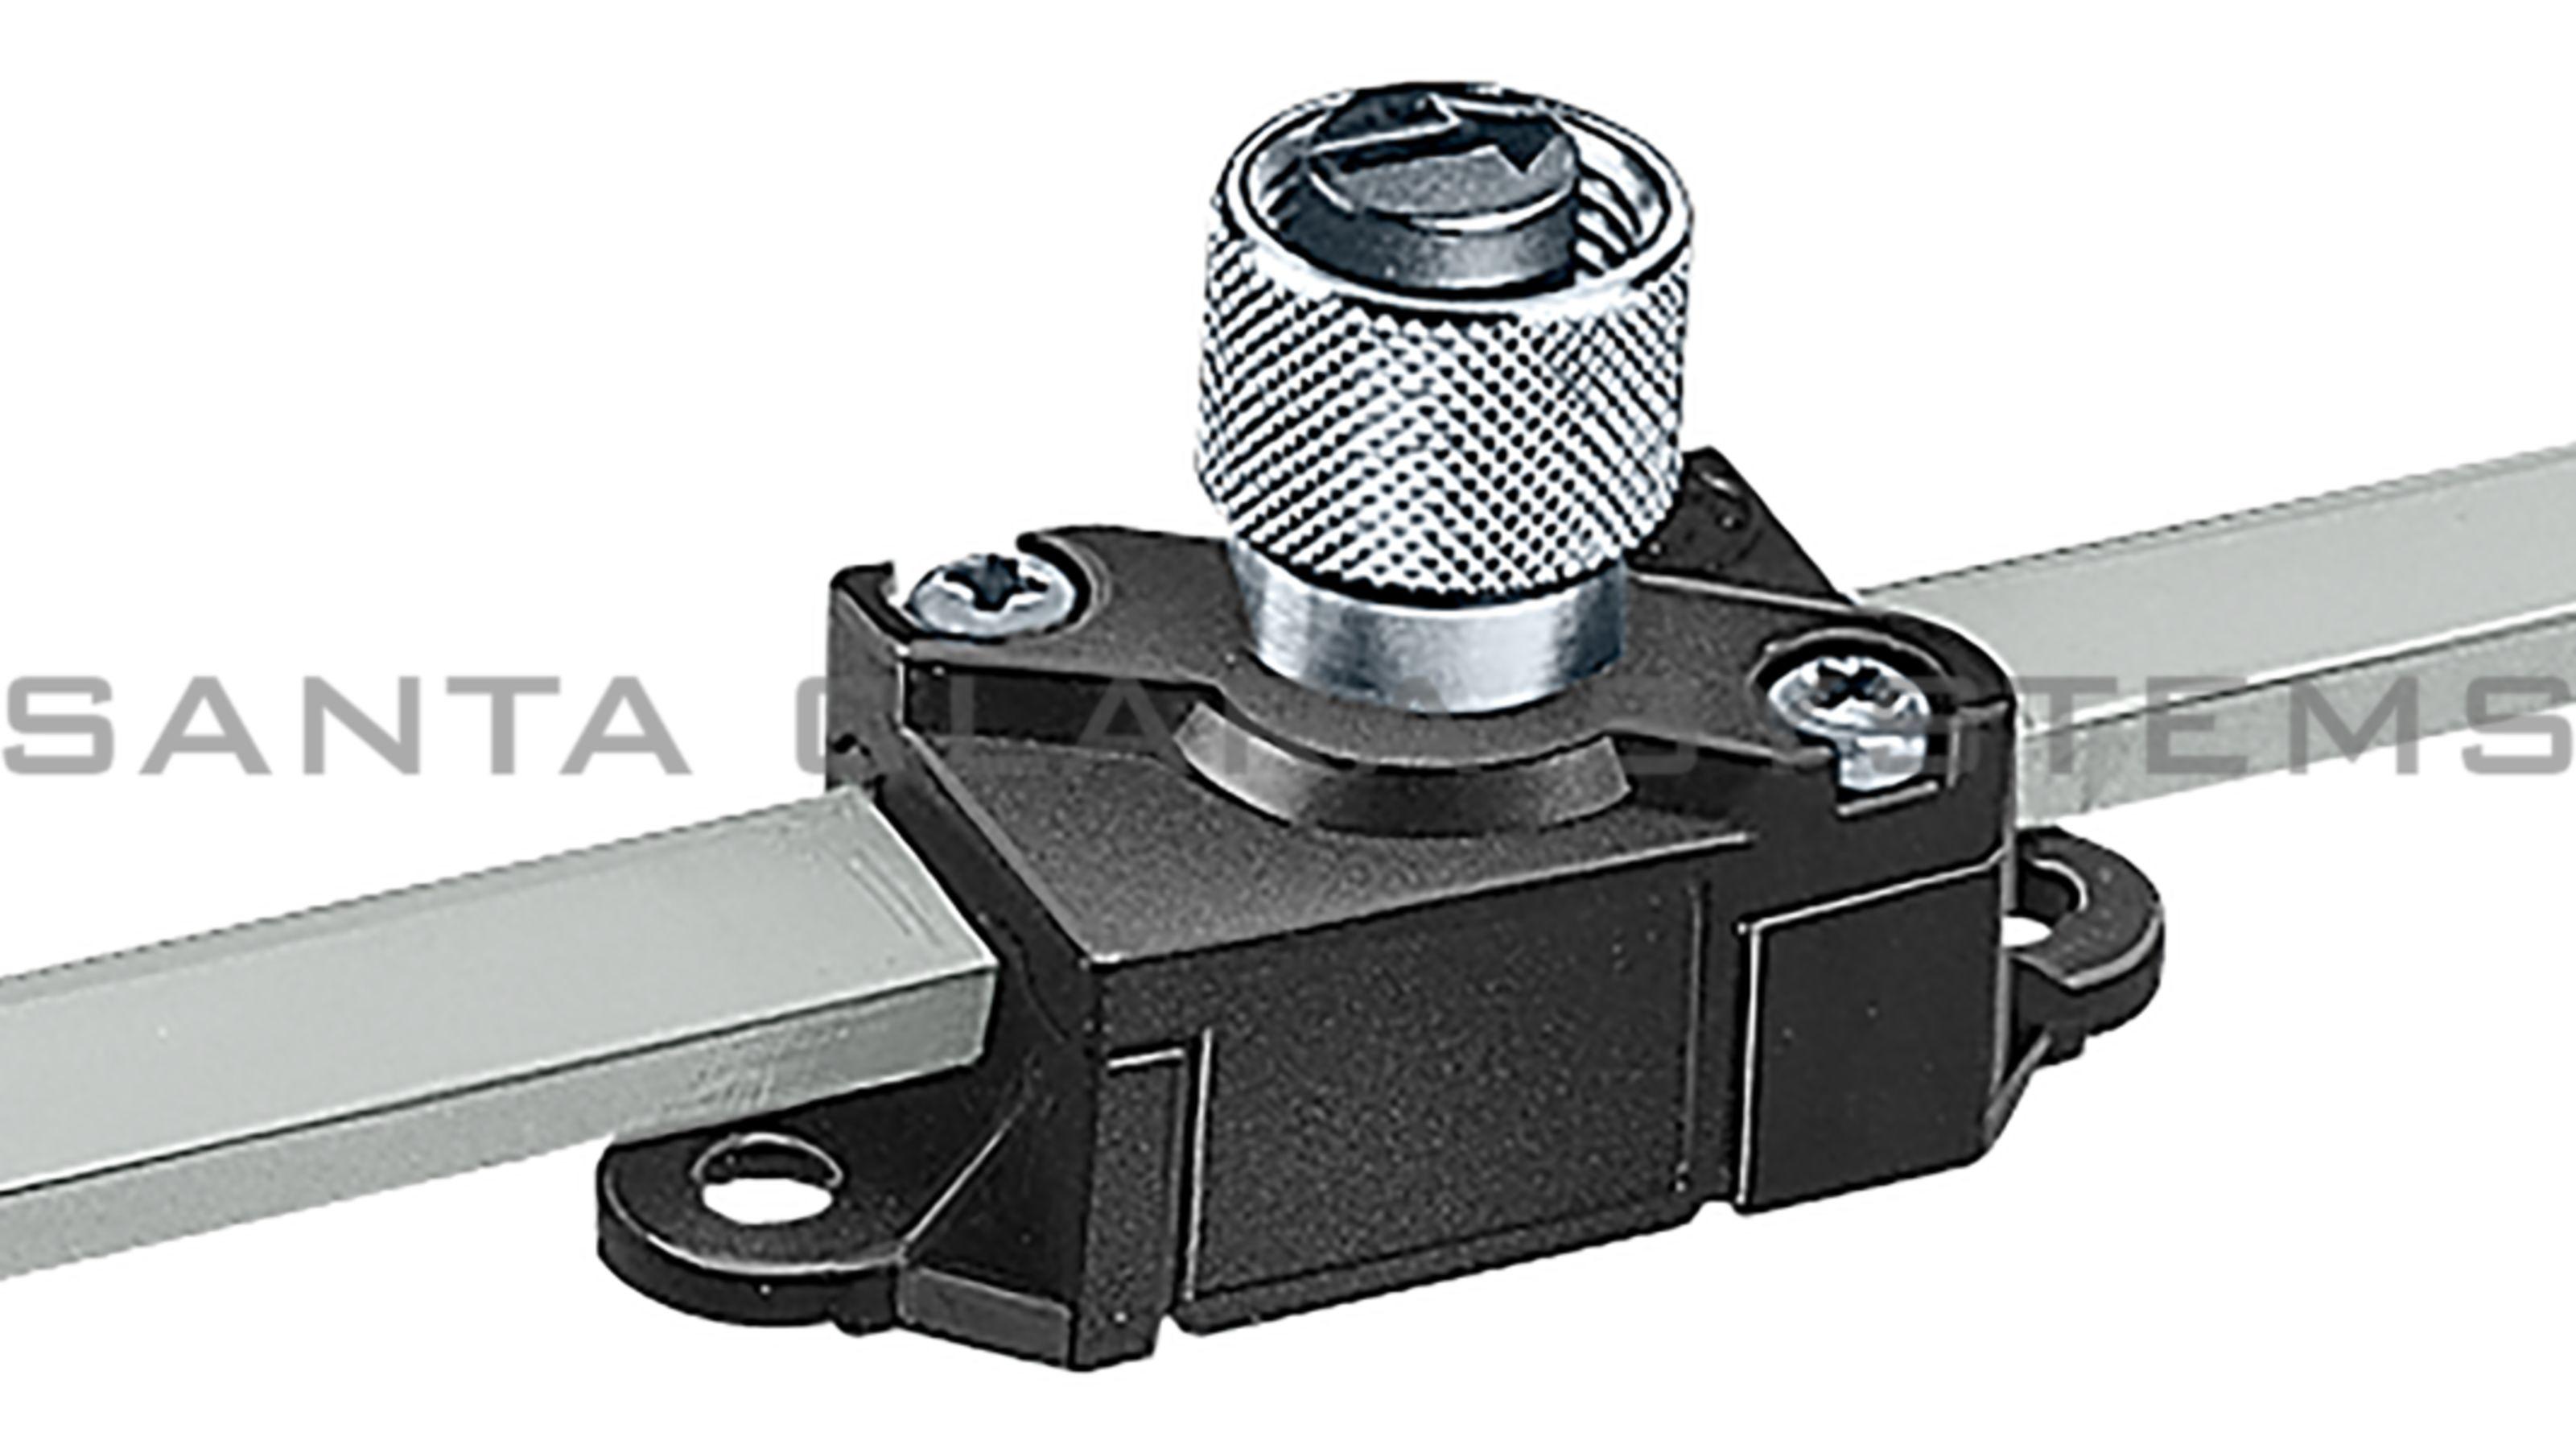 3RX9801-0AA00 3RX98010AA00